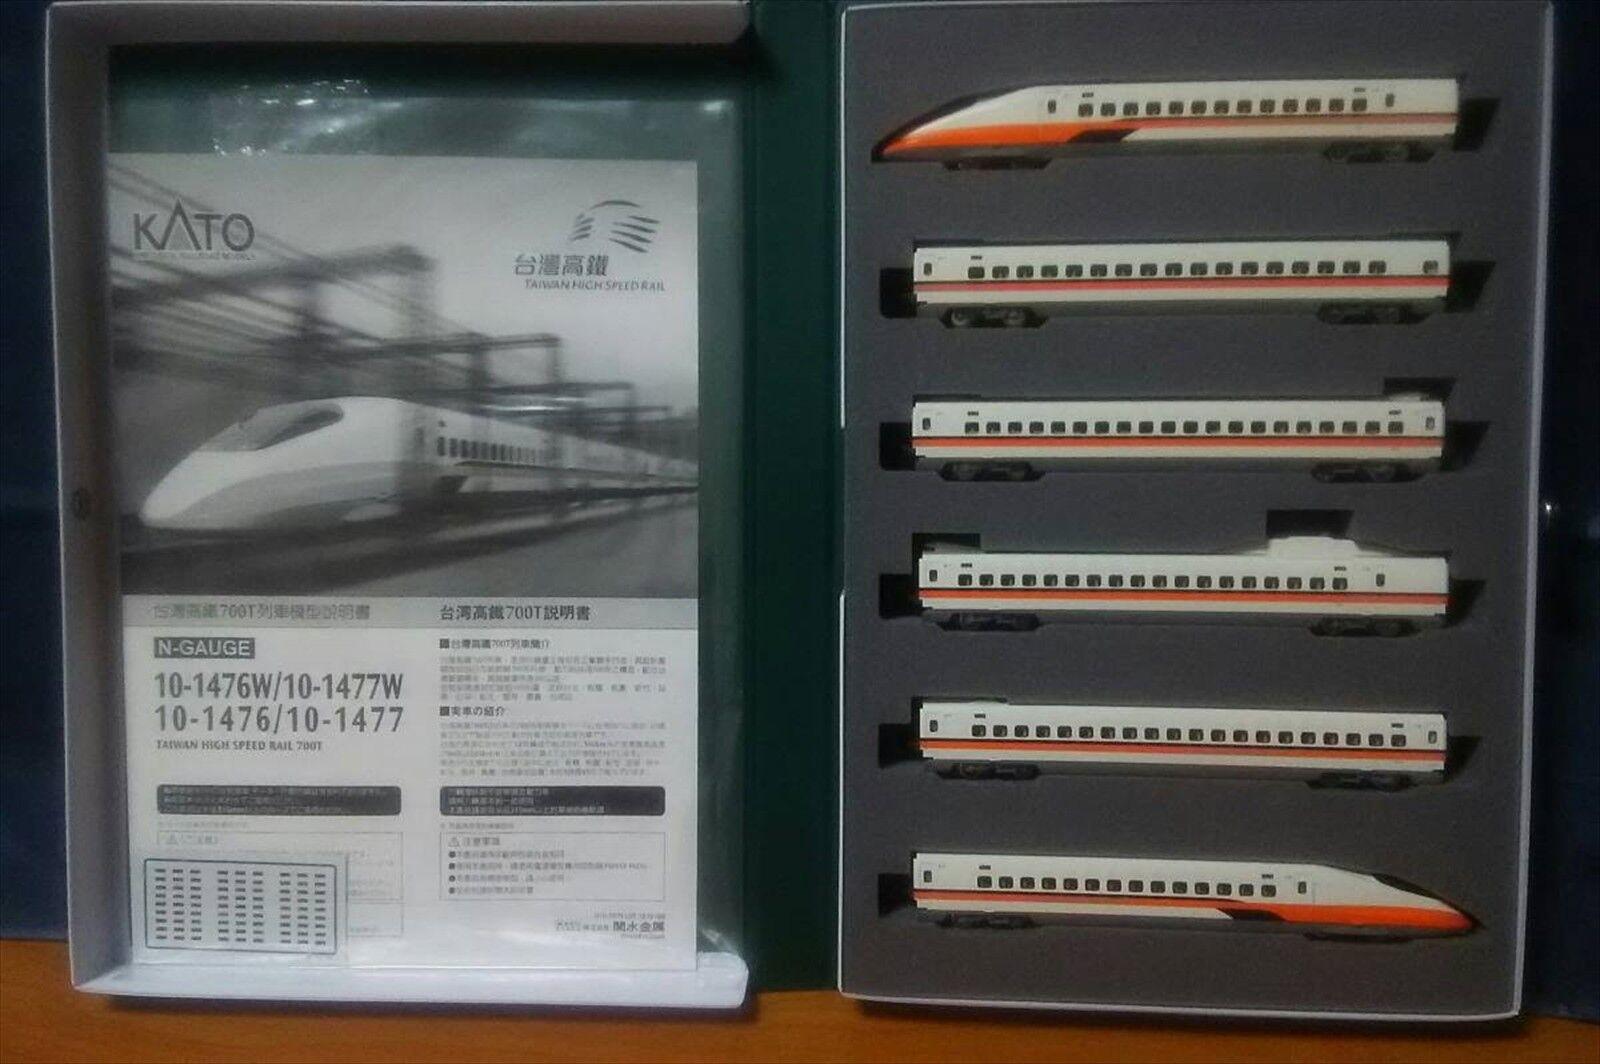 KATO 10-1476 Taiwan High Speed Rail 700T Basic 6 cars set Japan NEW